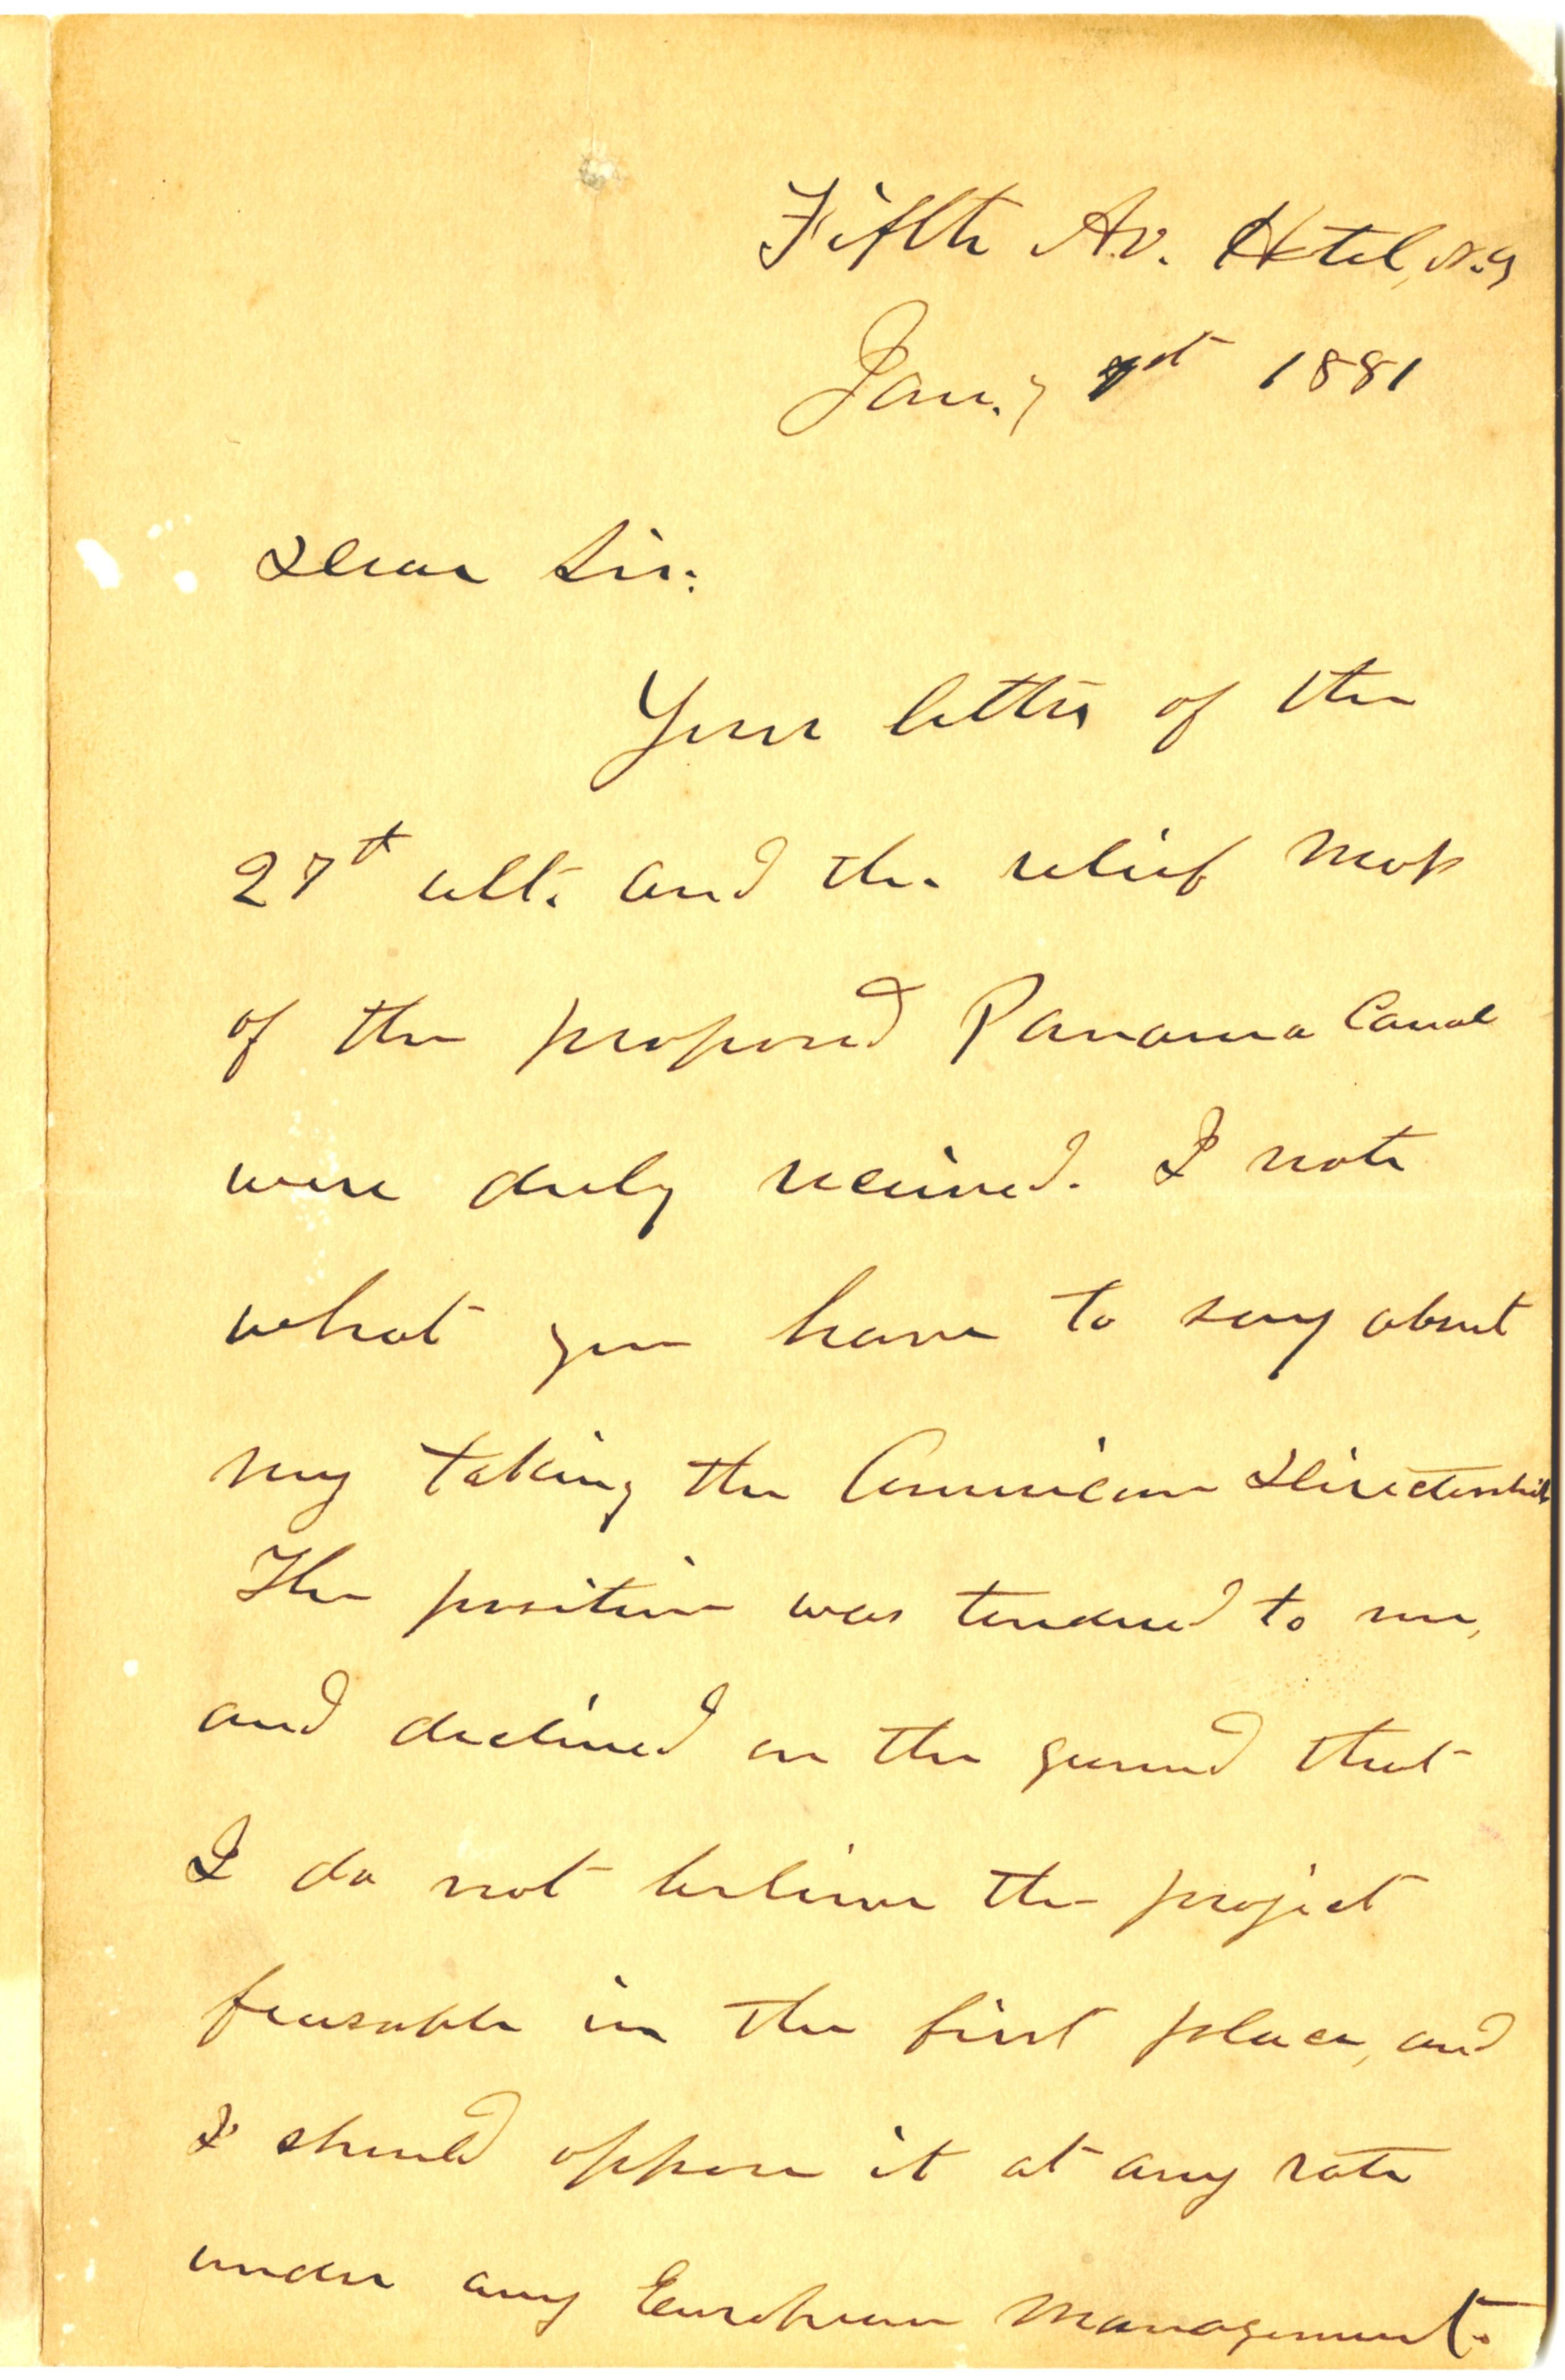 Ulysses S. Grant to Nathan Appleton, January 7, 1881 (Gilder Lehrman Collection)